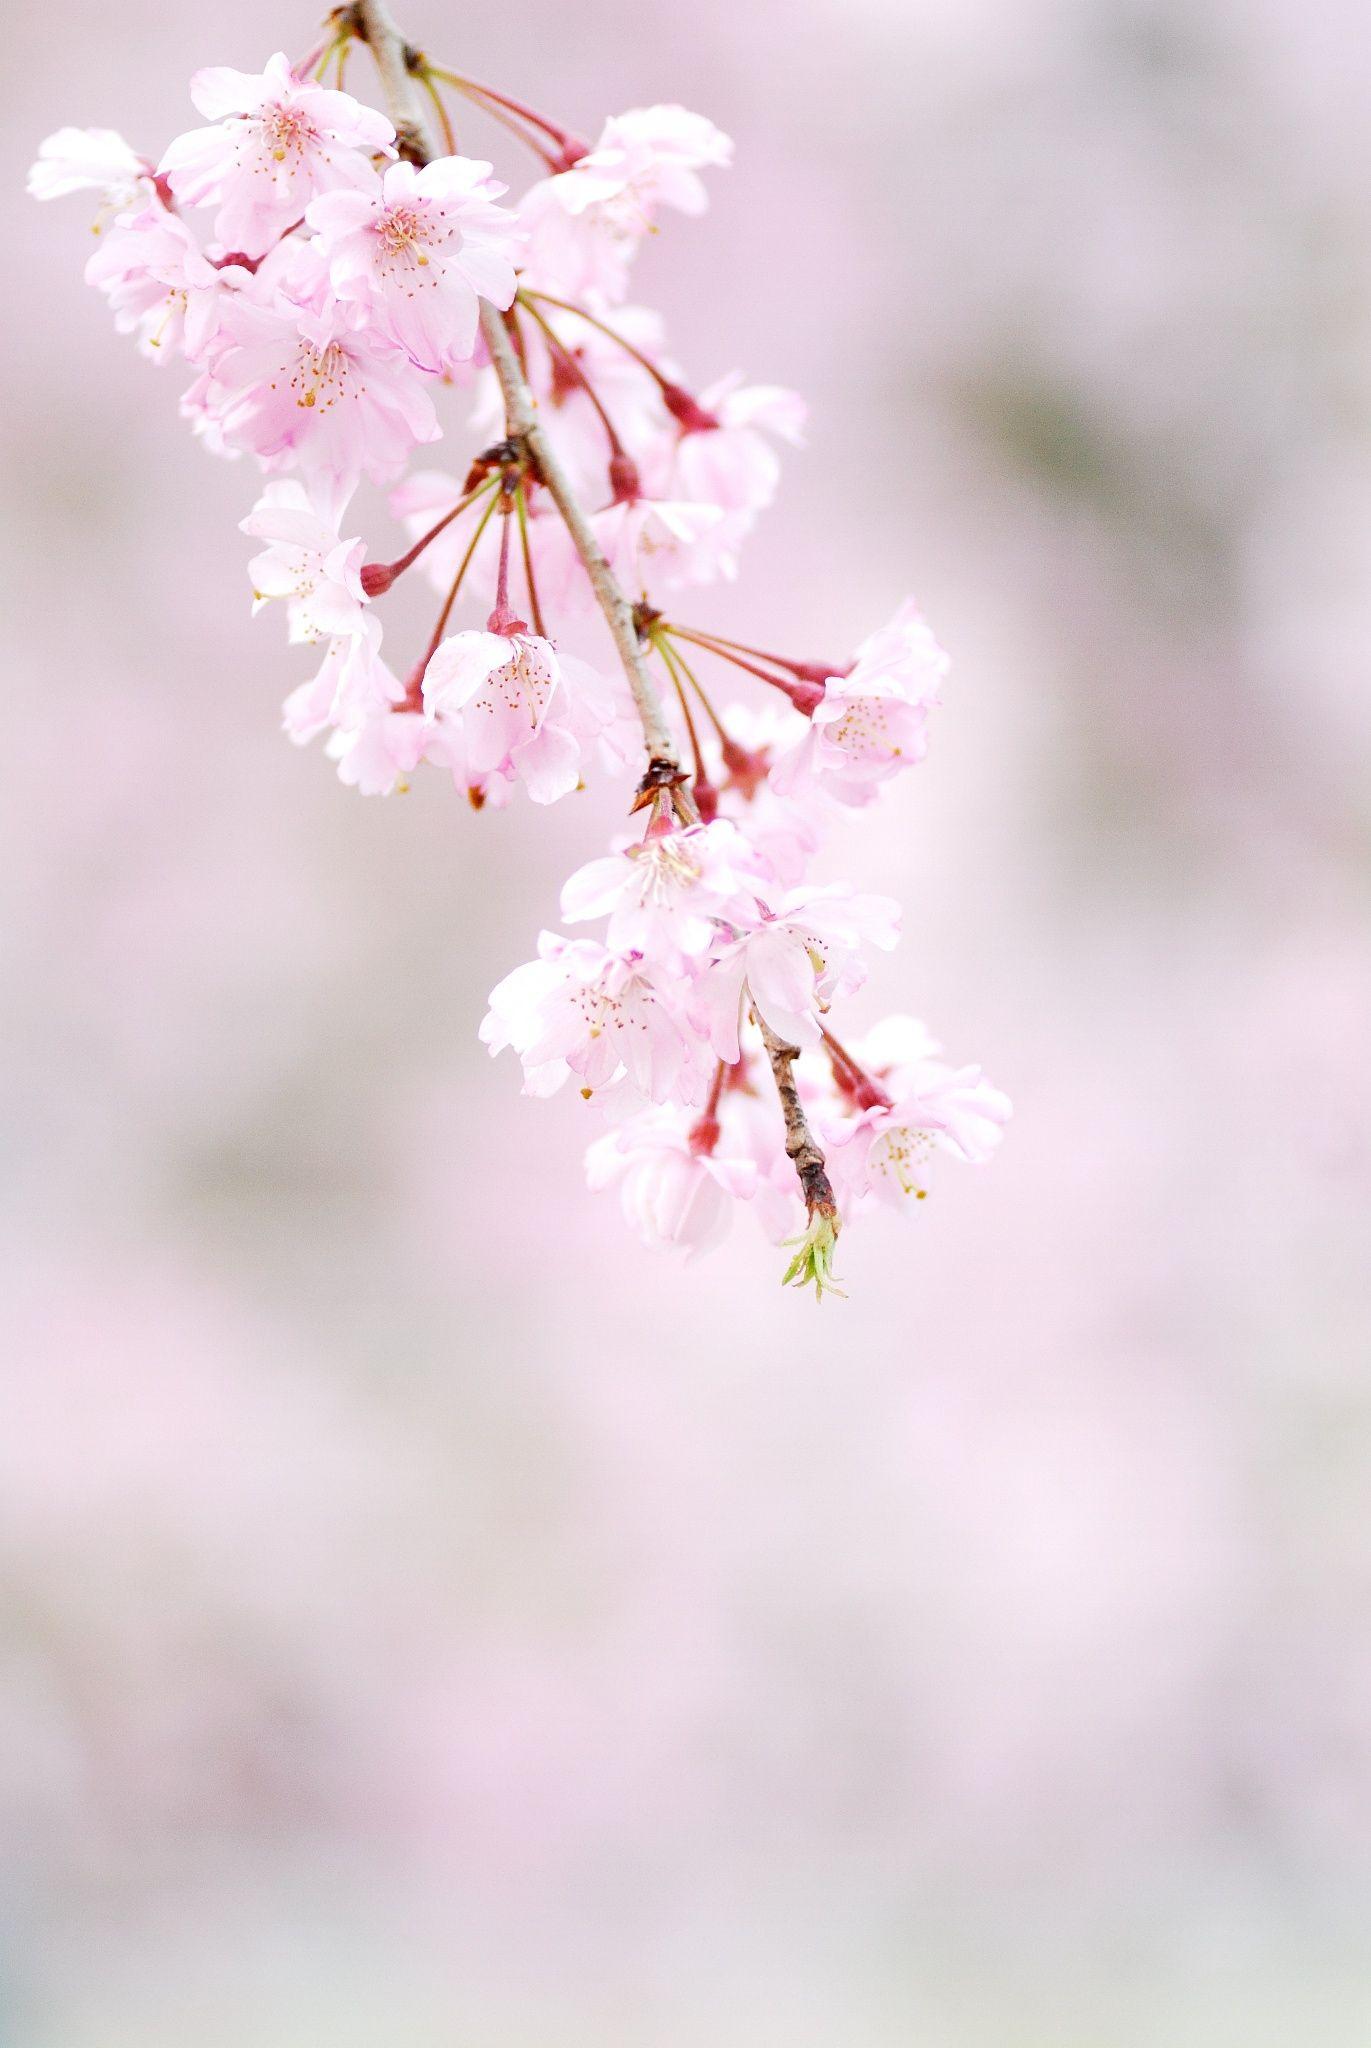 Weeping Cherry Cherry Blossom Girl Cherry Blossom Tree Beautiful Flowers